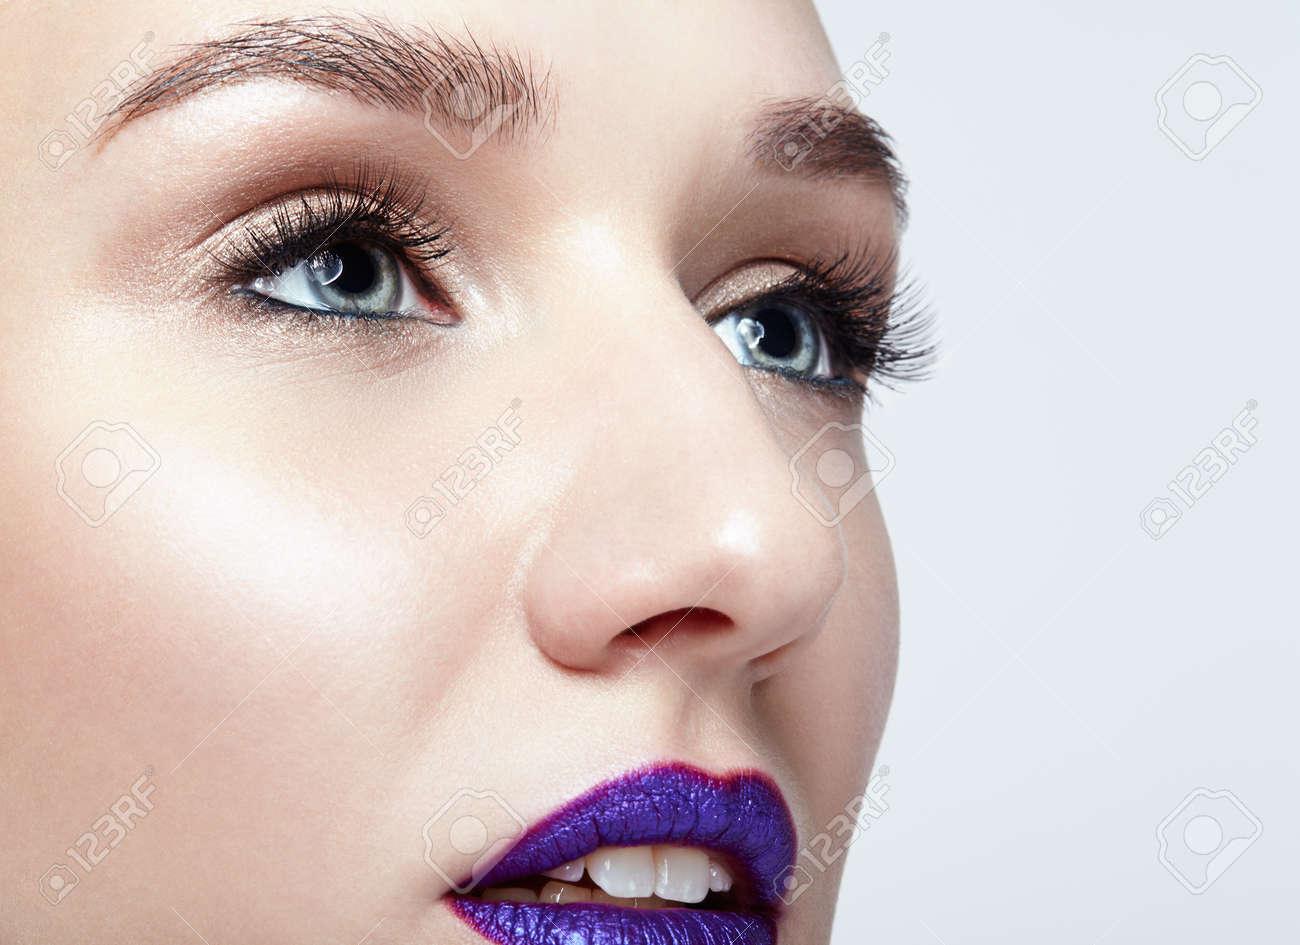 Closeup macro shot of human woman face. Female with natural eyes makeup and bright violet lips - 121765031